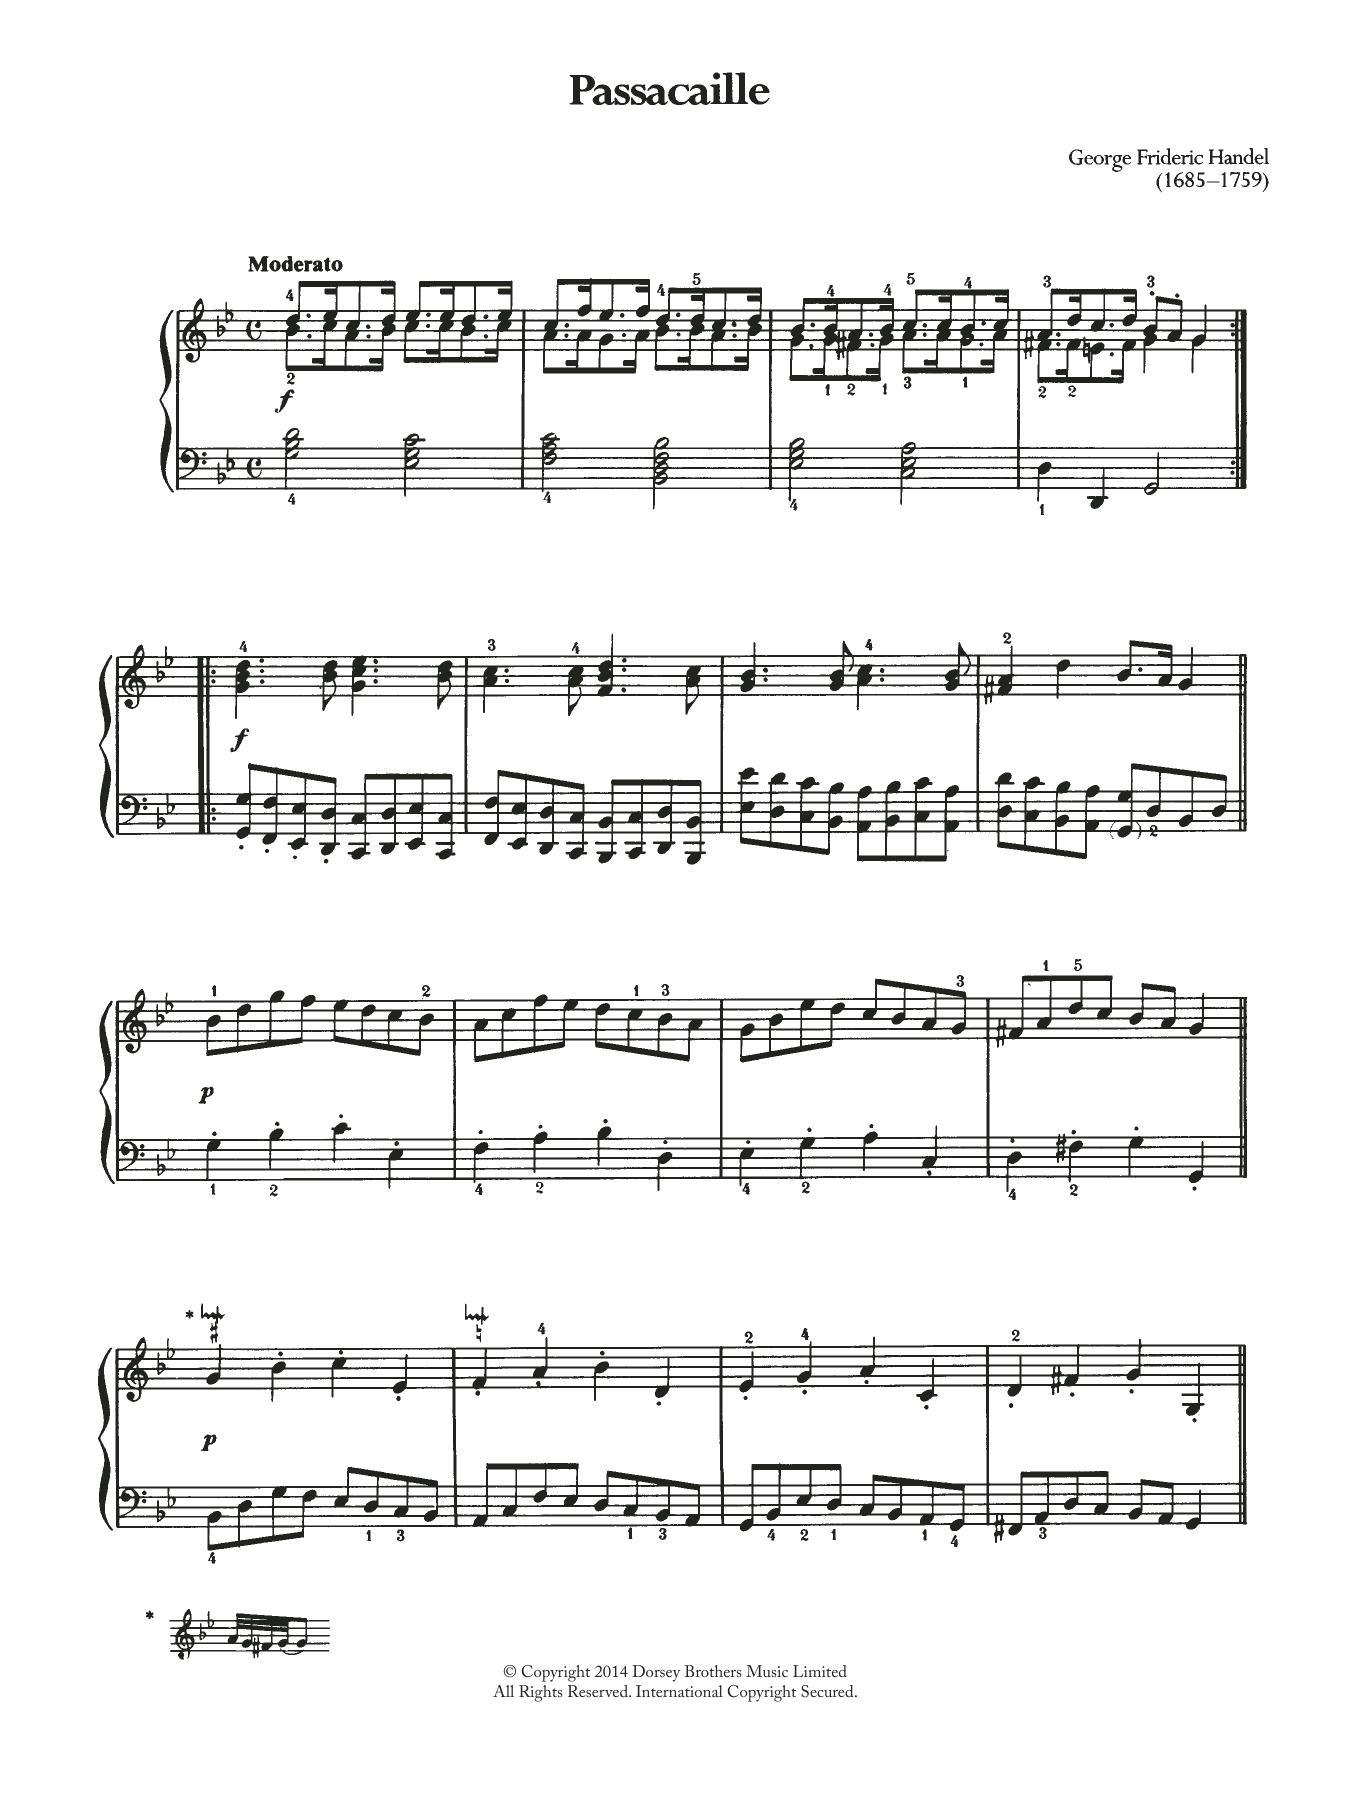 George Frideric Handel - Passacaille